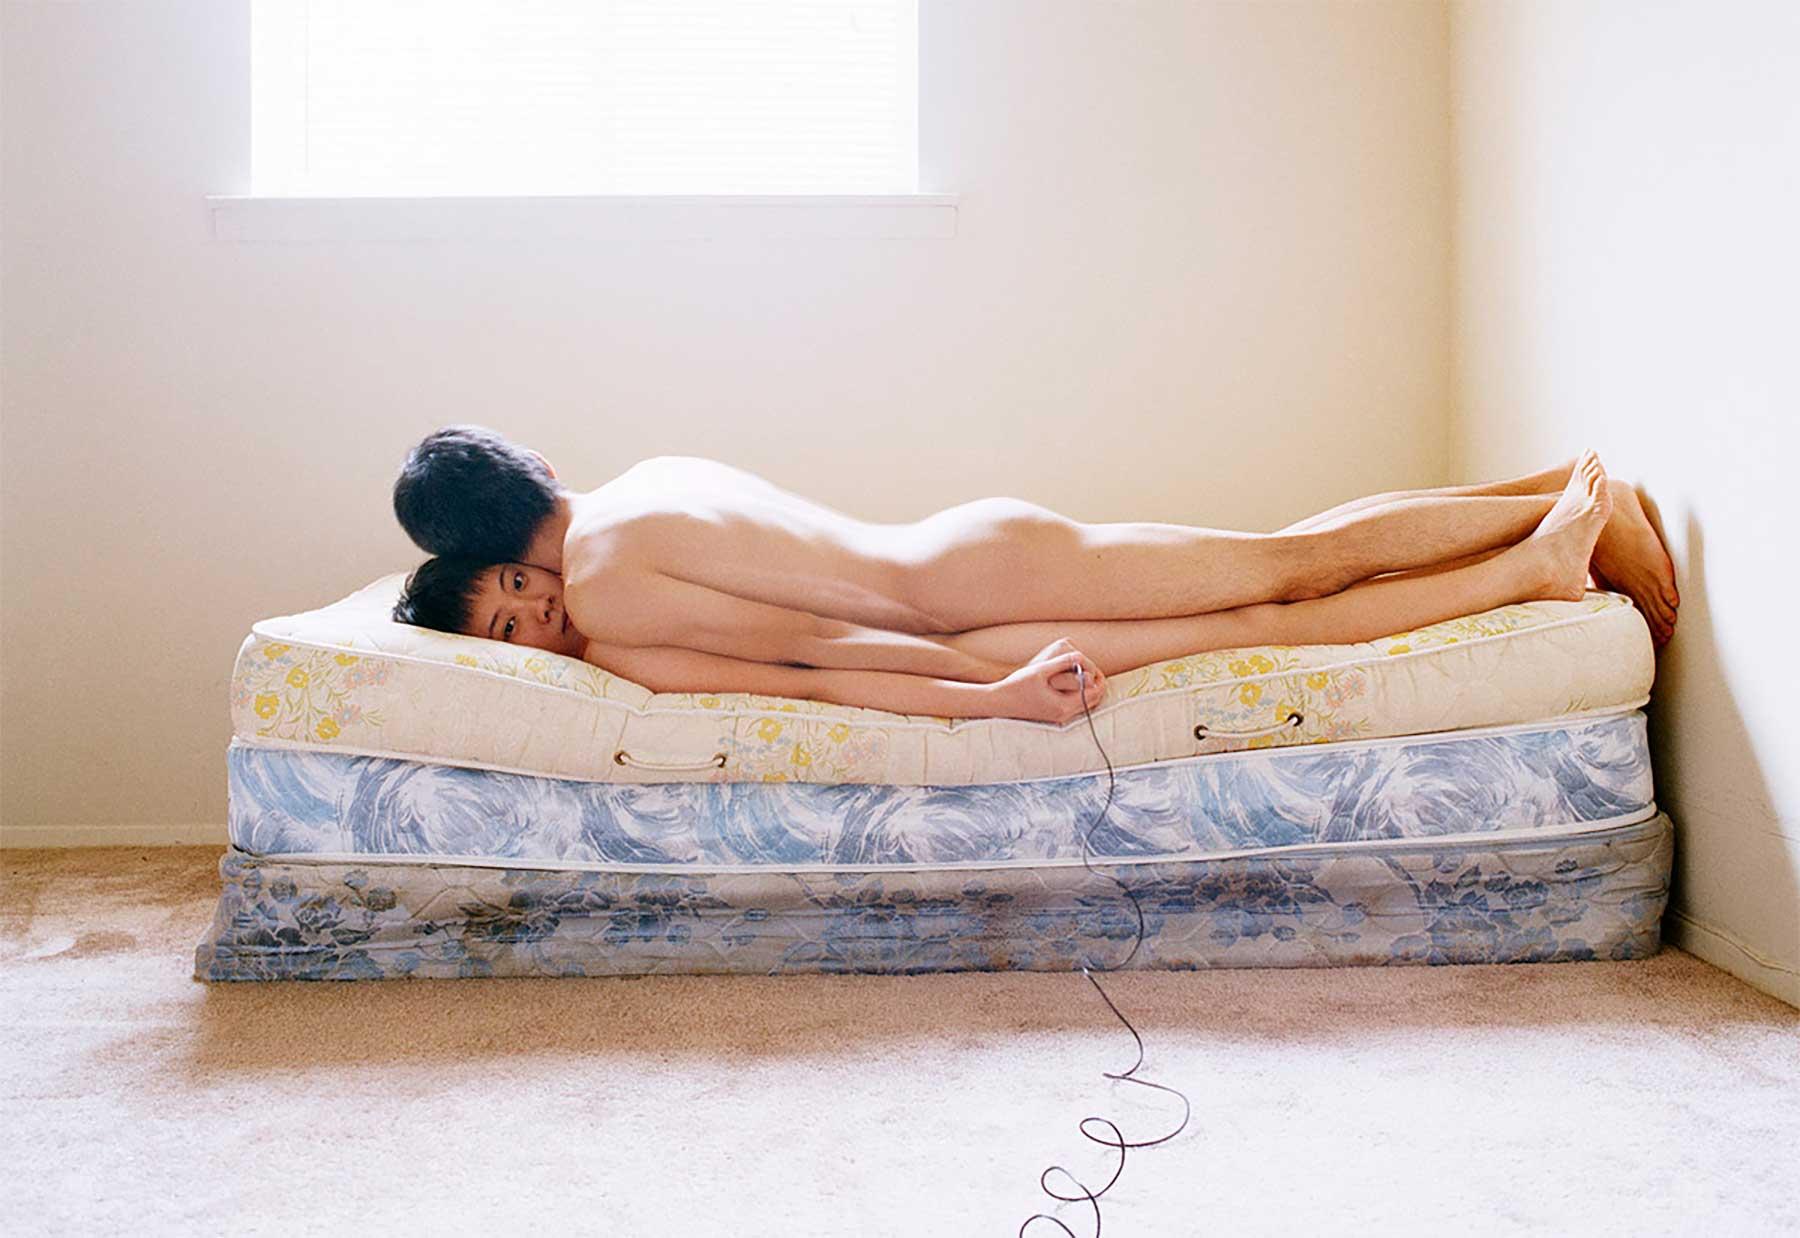 Skurrile Pärchenfotos von Pixy Liao experimental-relationship-Pixy-Liao